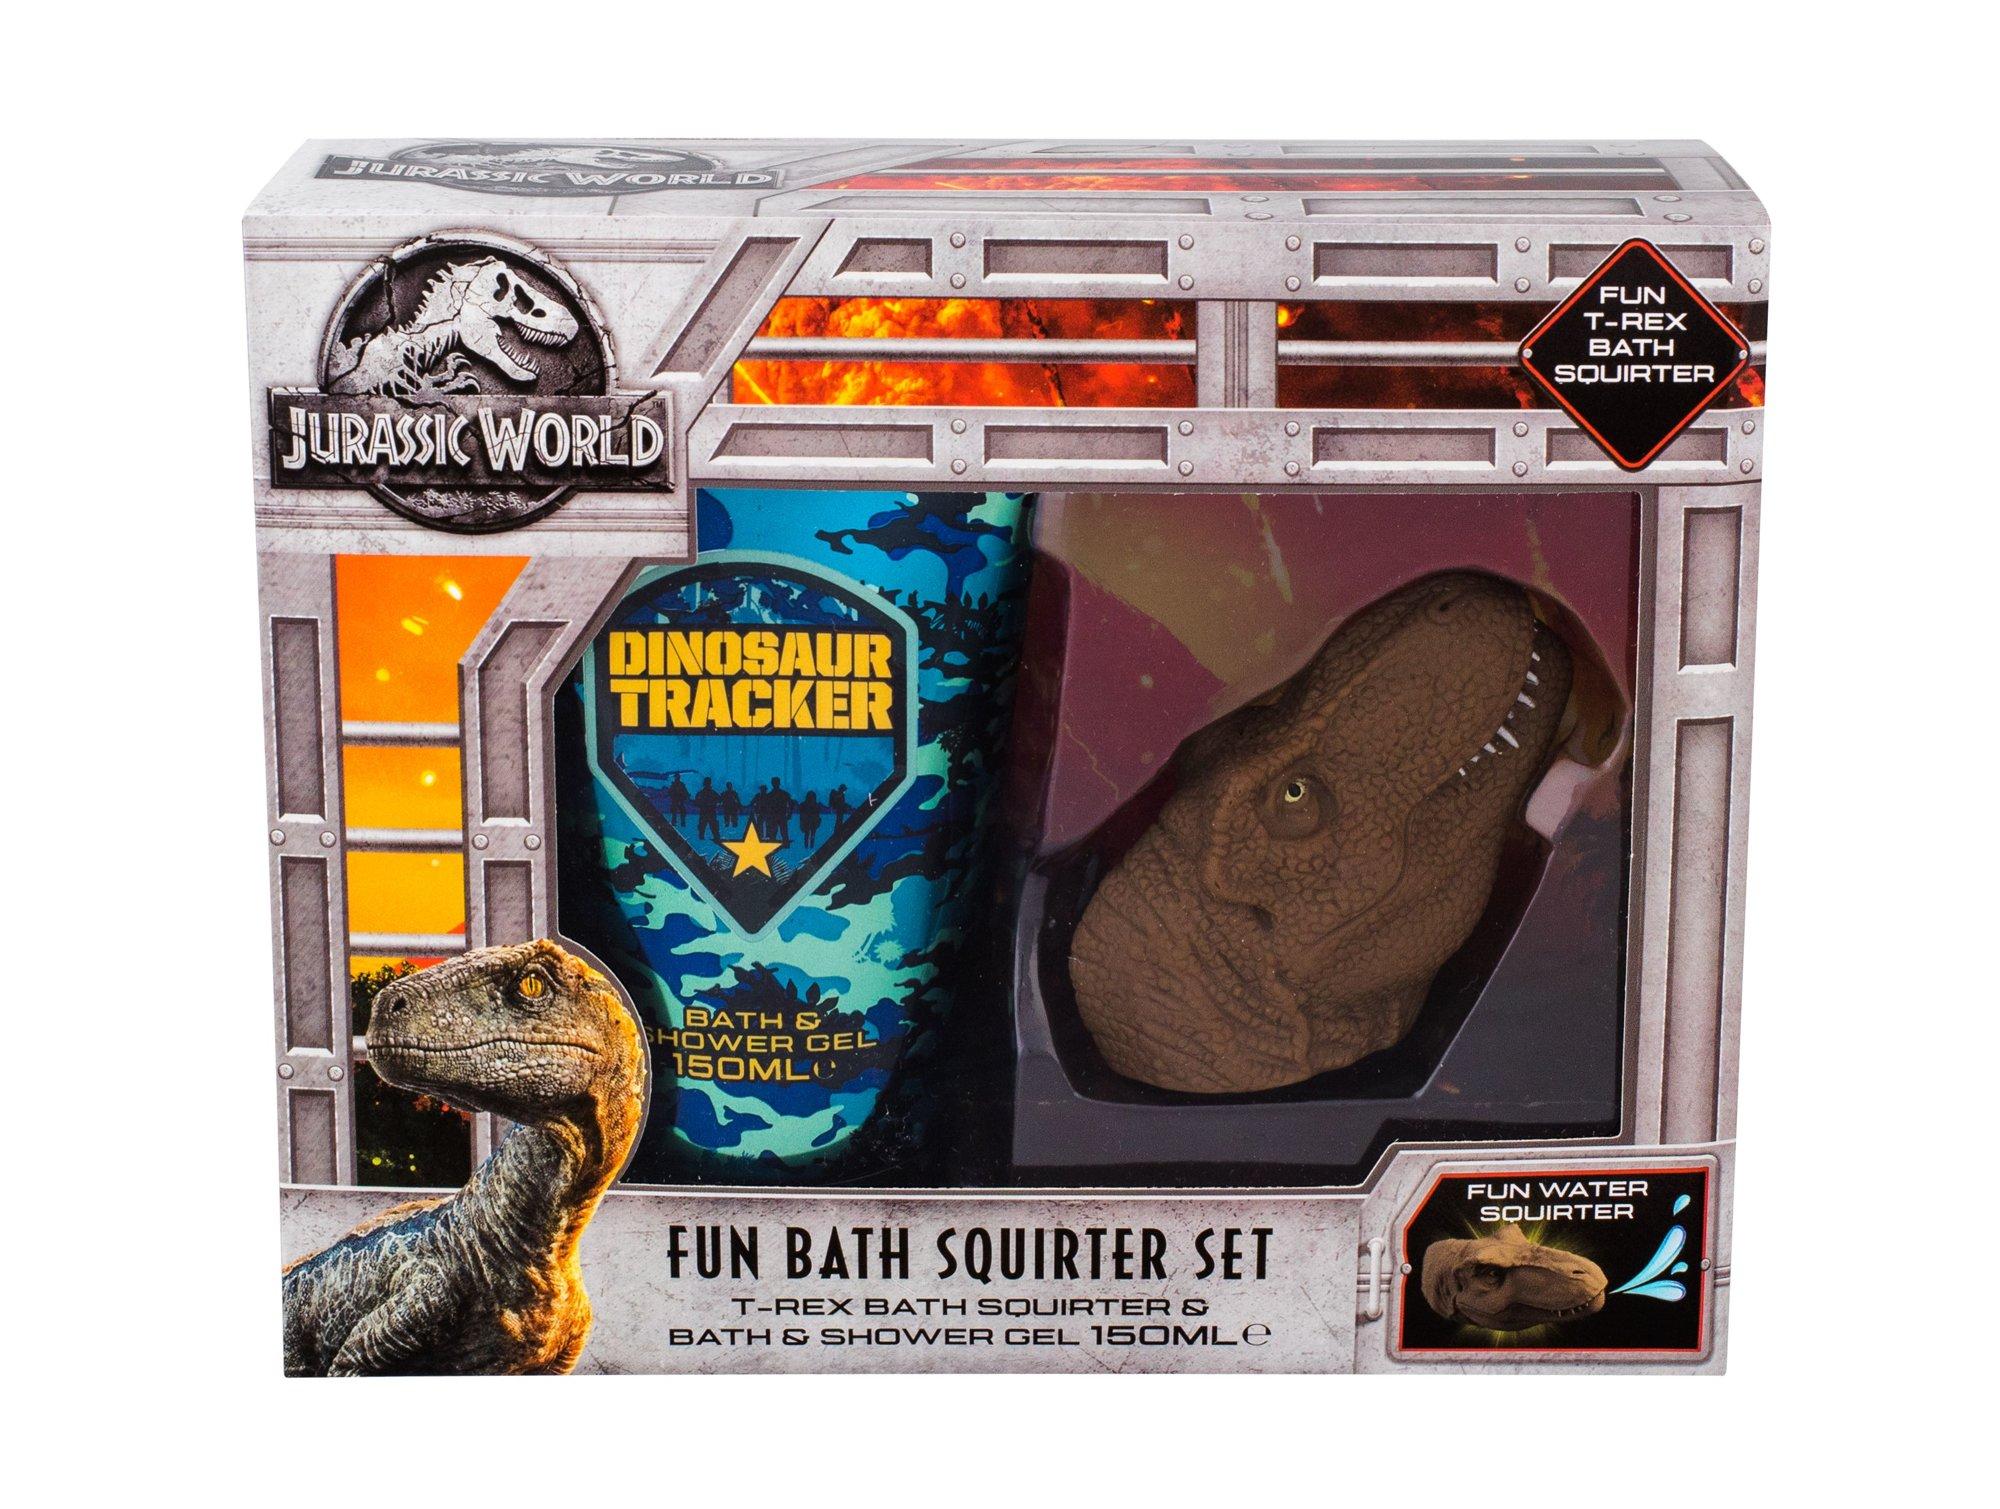 Universal Jurassic World Shower Gel 150ml